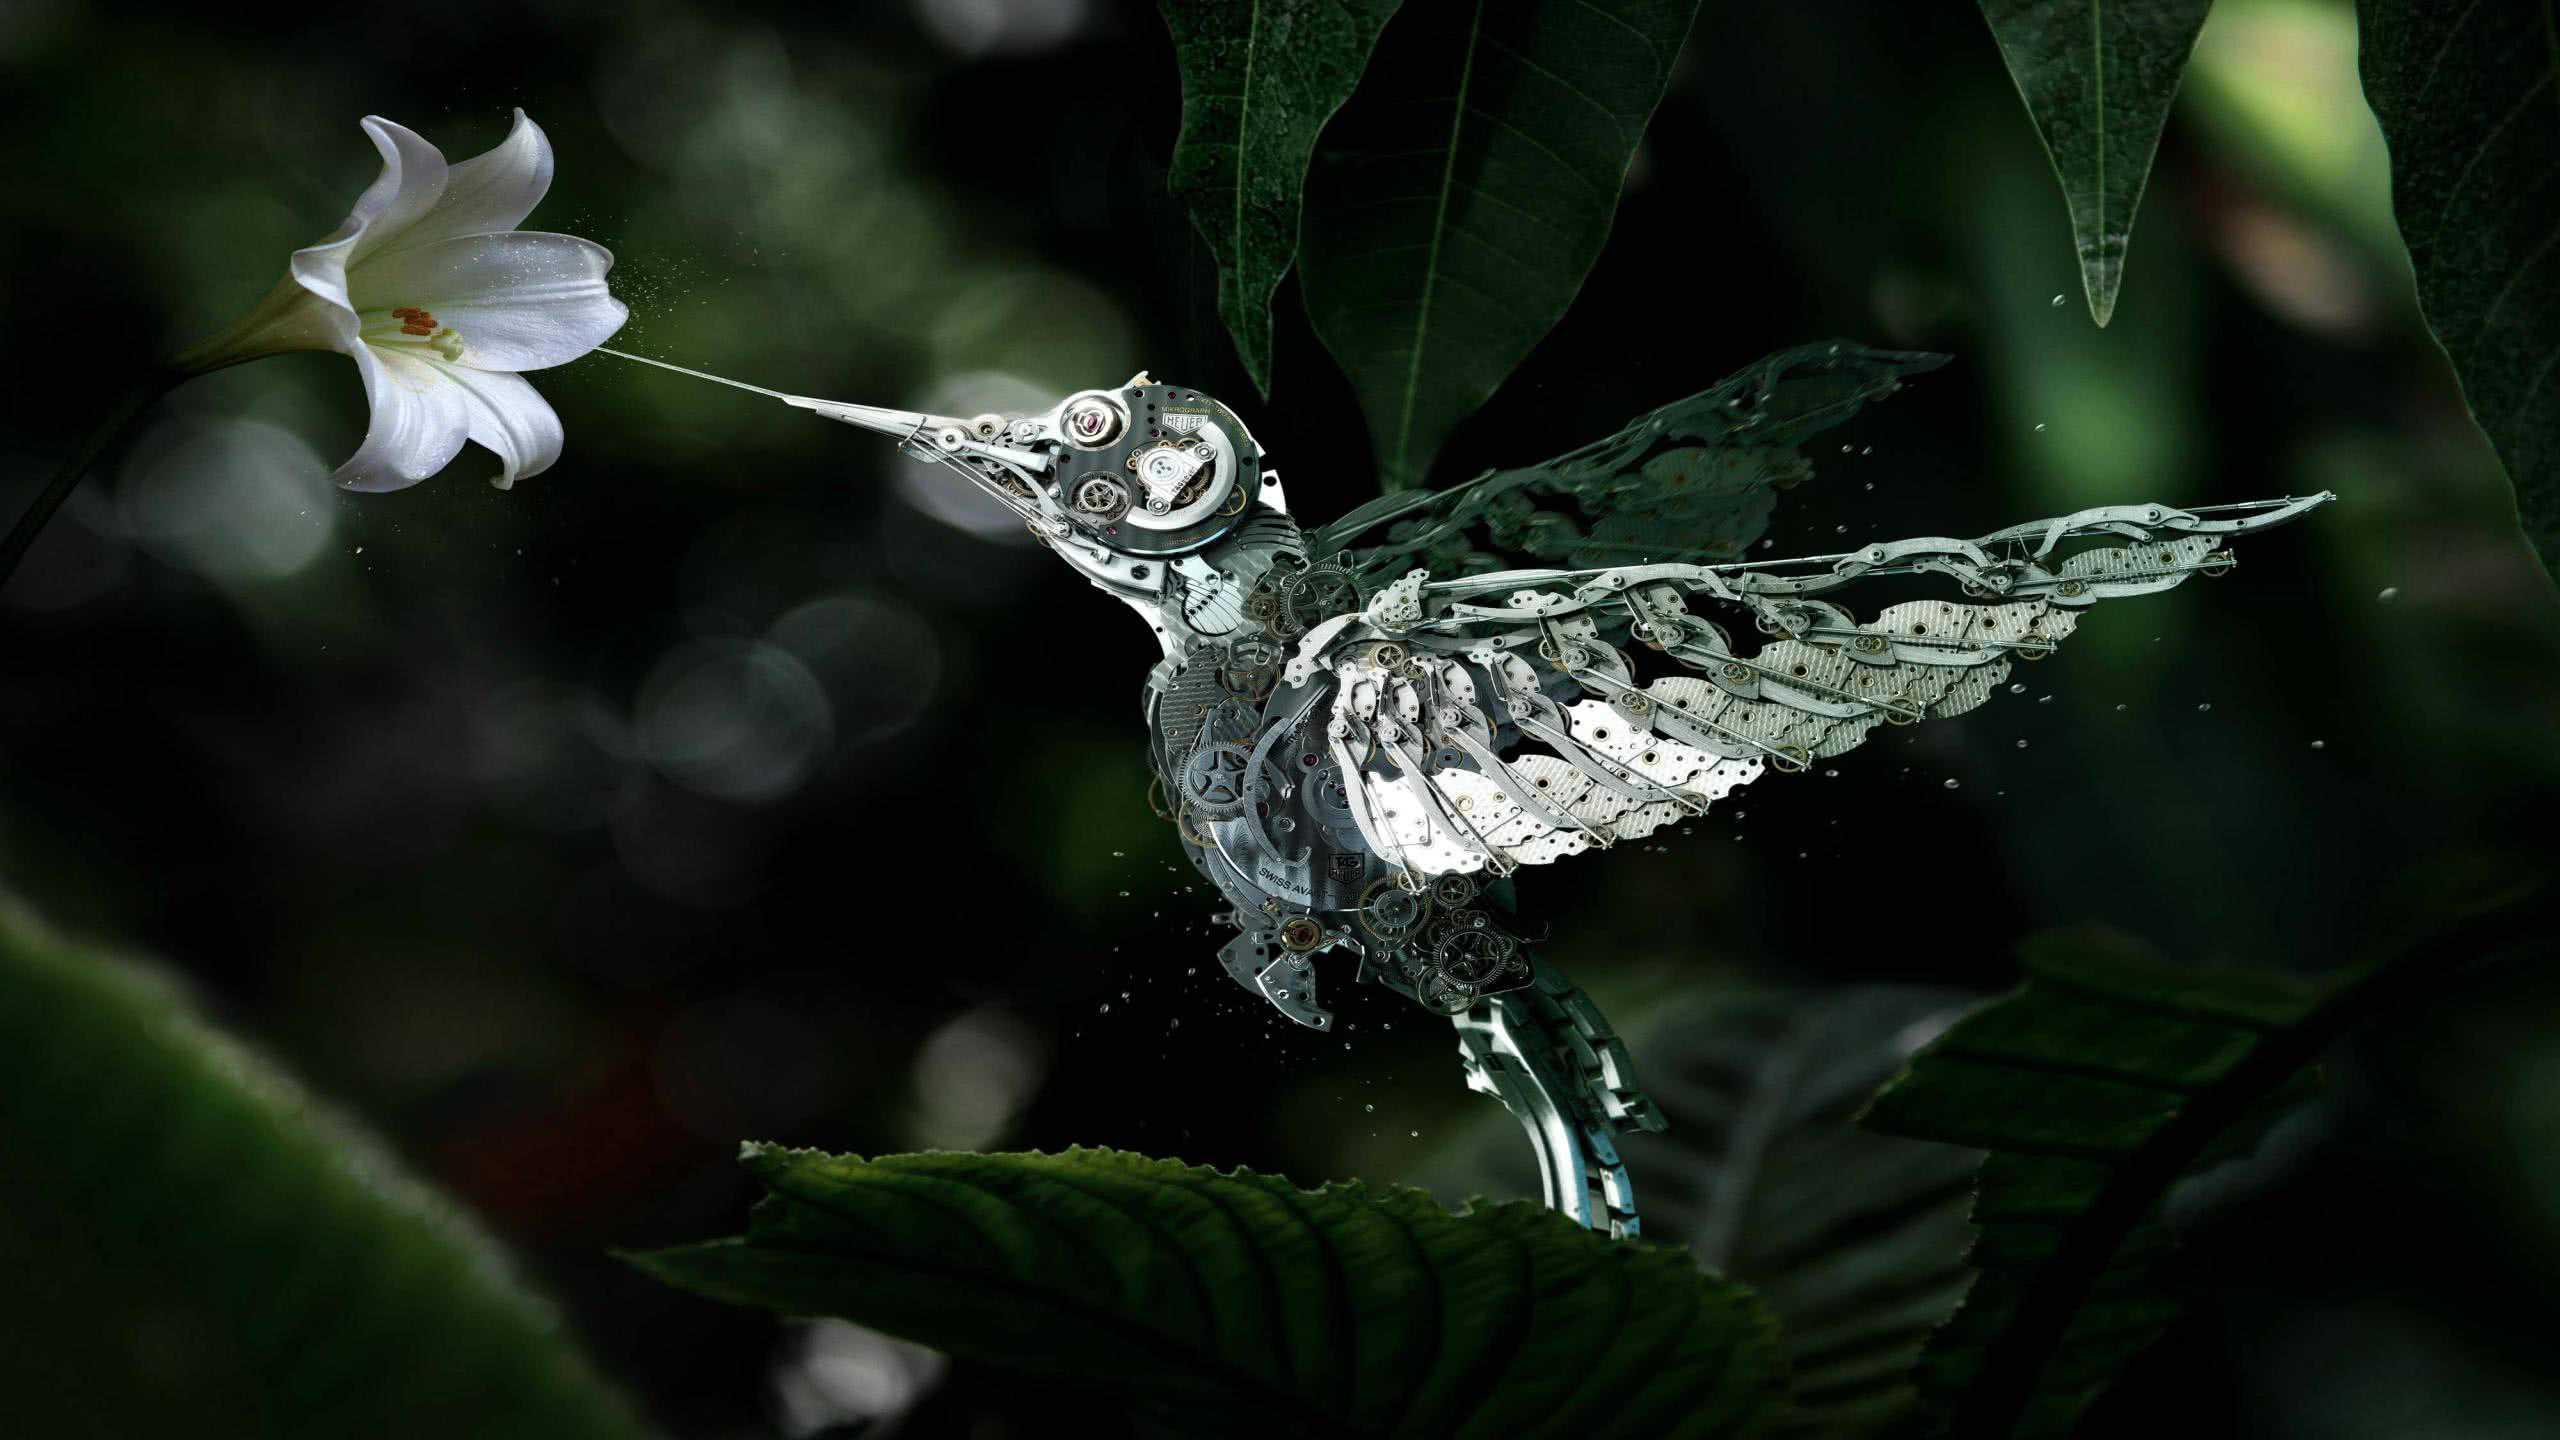 2017 Trucks >> Mechanical Hummingbird WQHD 1440p Wallpaper | Pixelz